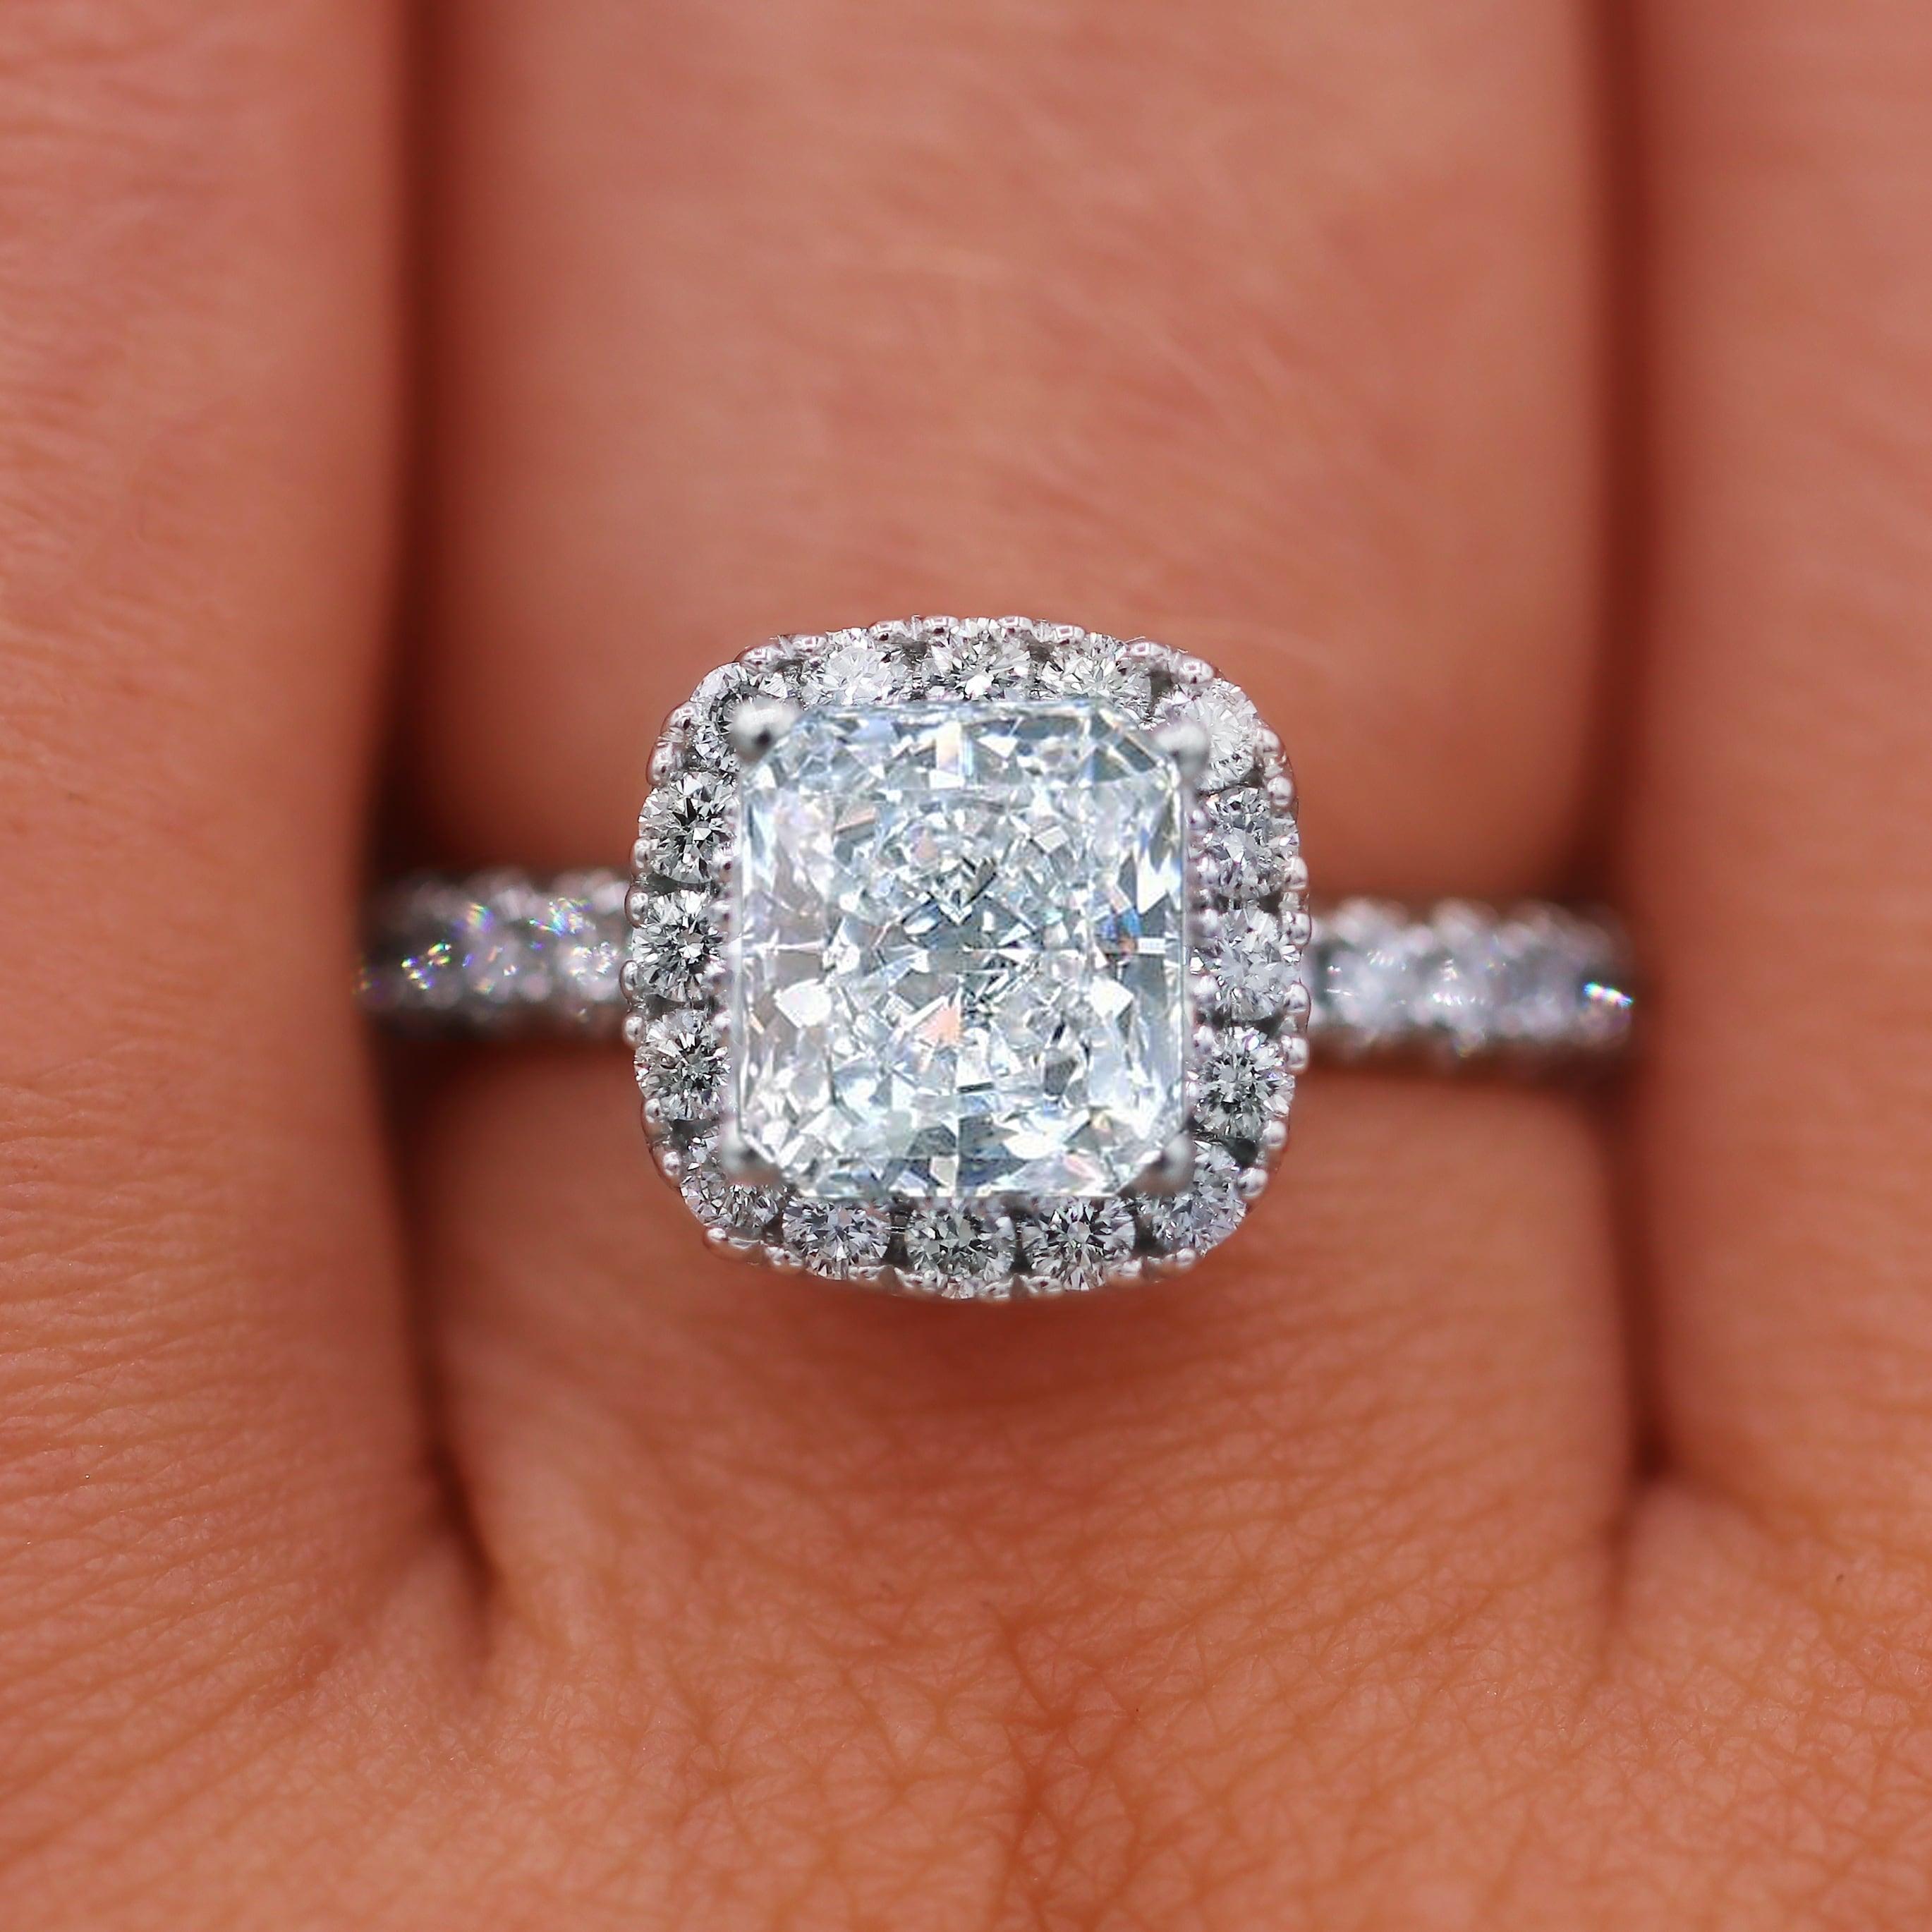 18kt White Gold 2 68 Carat Cushion Cut Diamond Engagement Ring